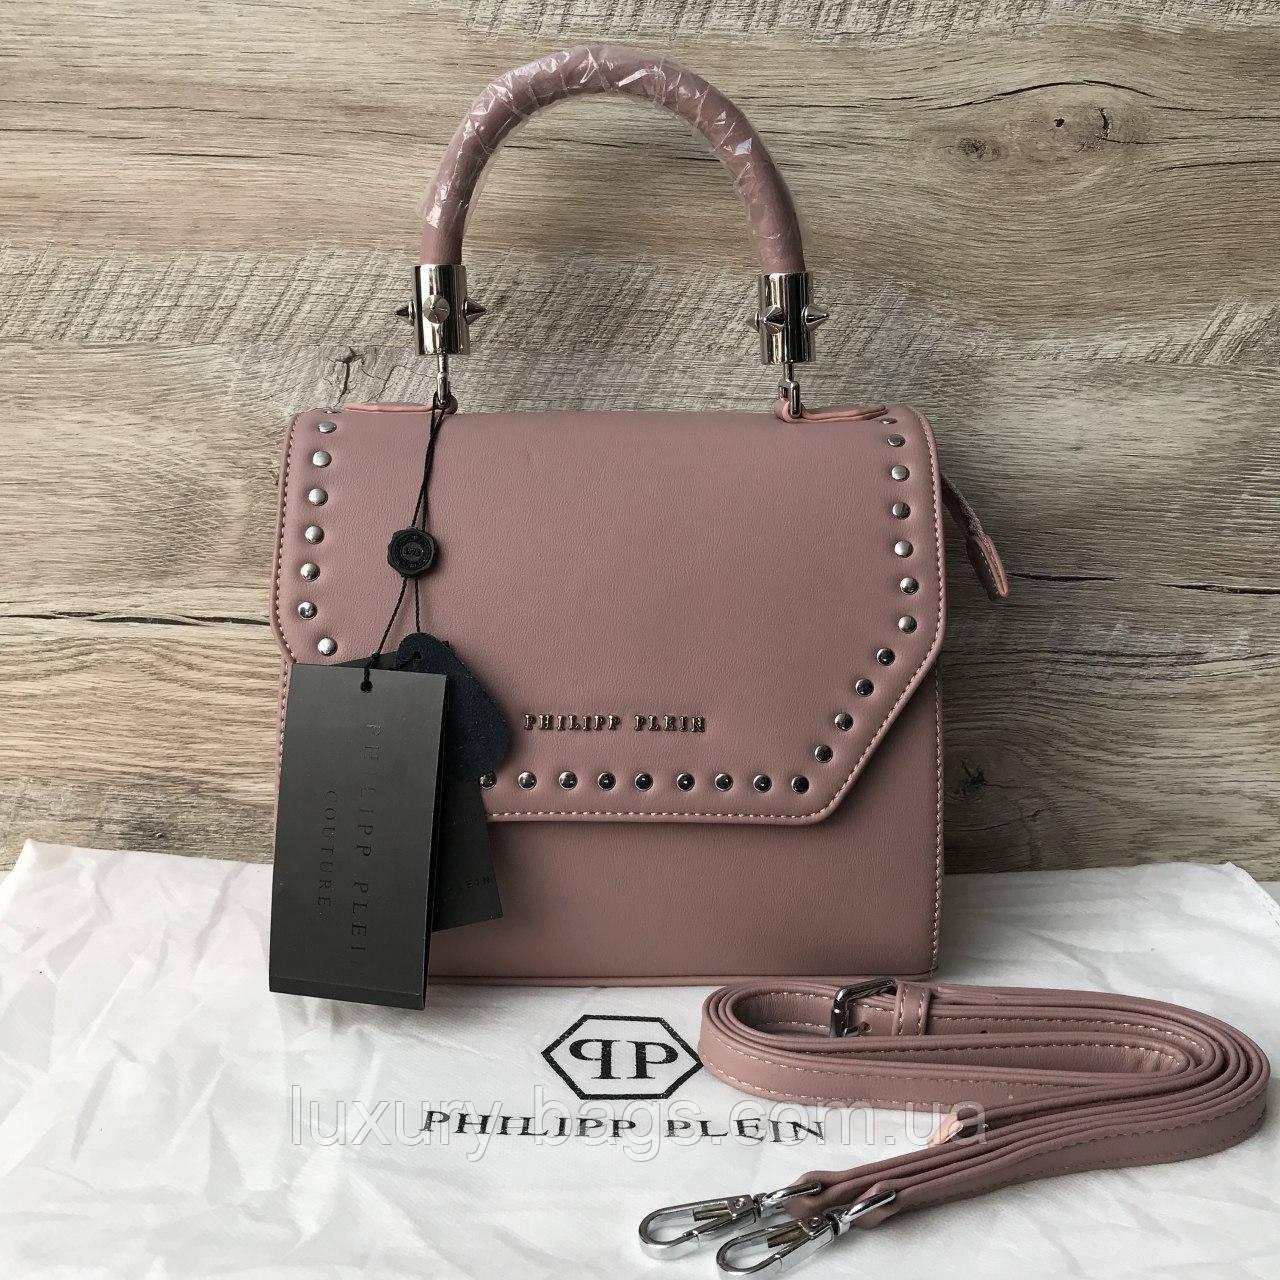 Жіноча стильна сумка Philipp Plein